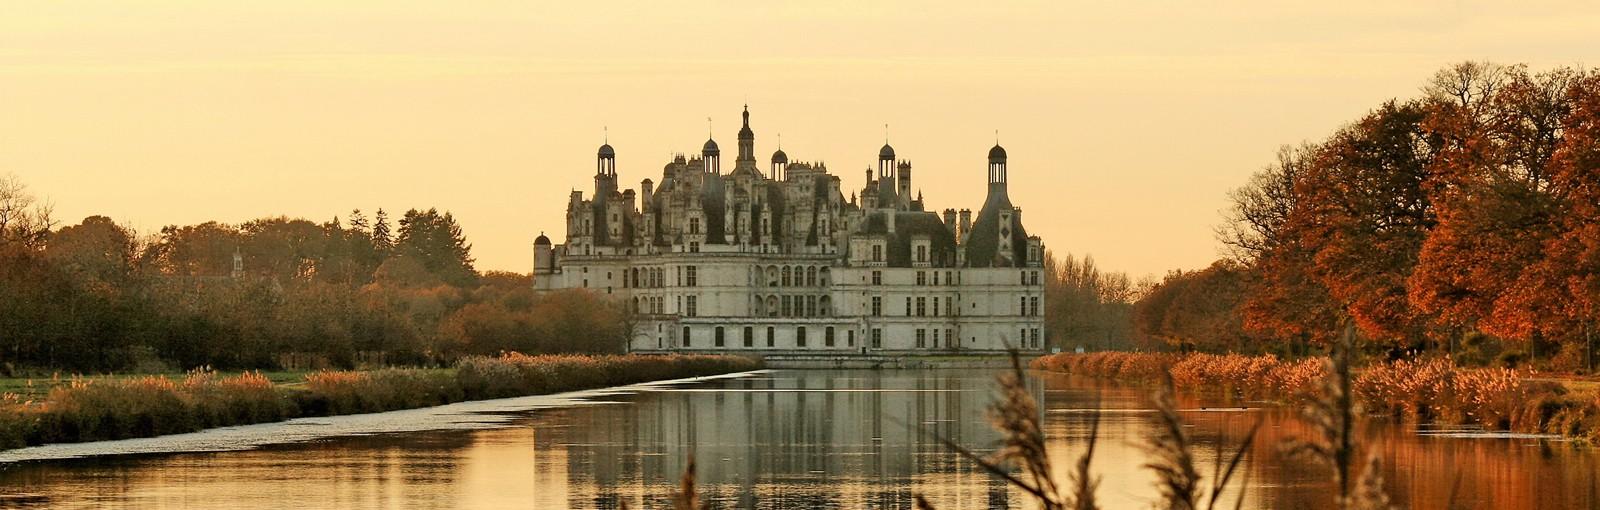 Tours Chambord, Chenonceau y Cheverny o Chaumont o Blois - Días completos - Excursiones desde París